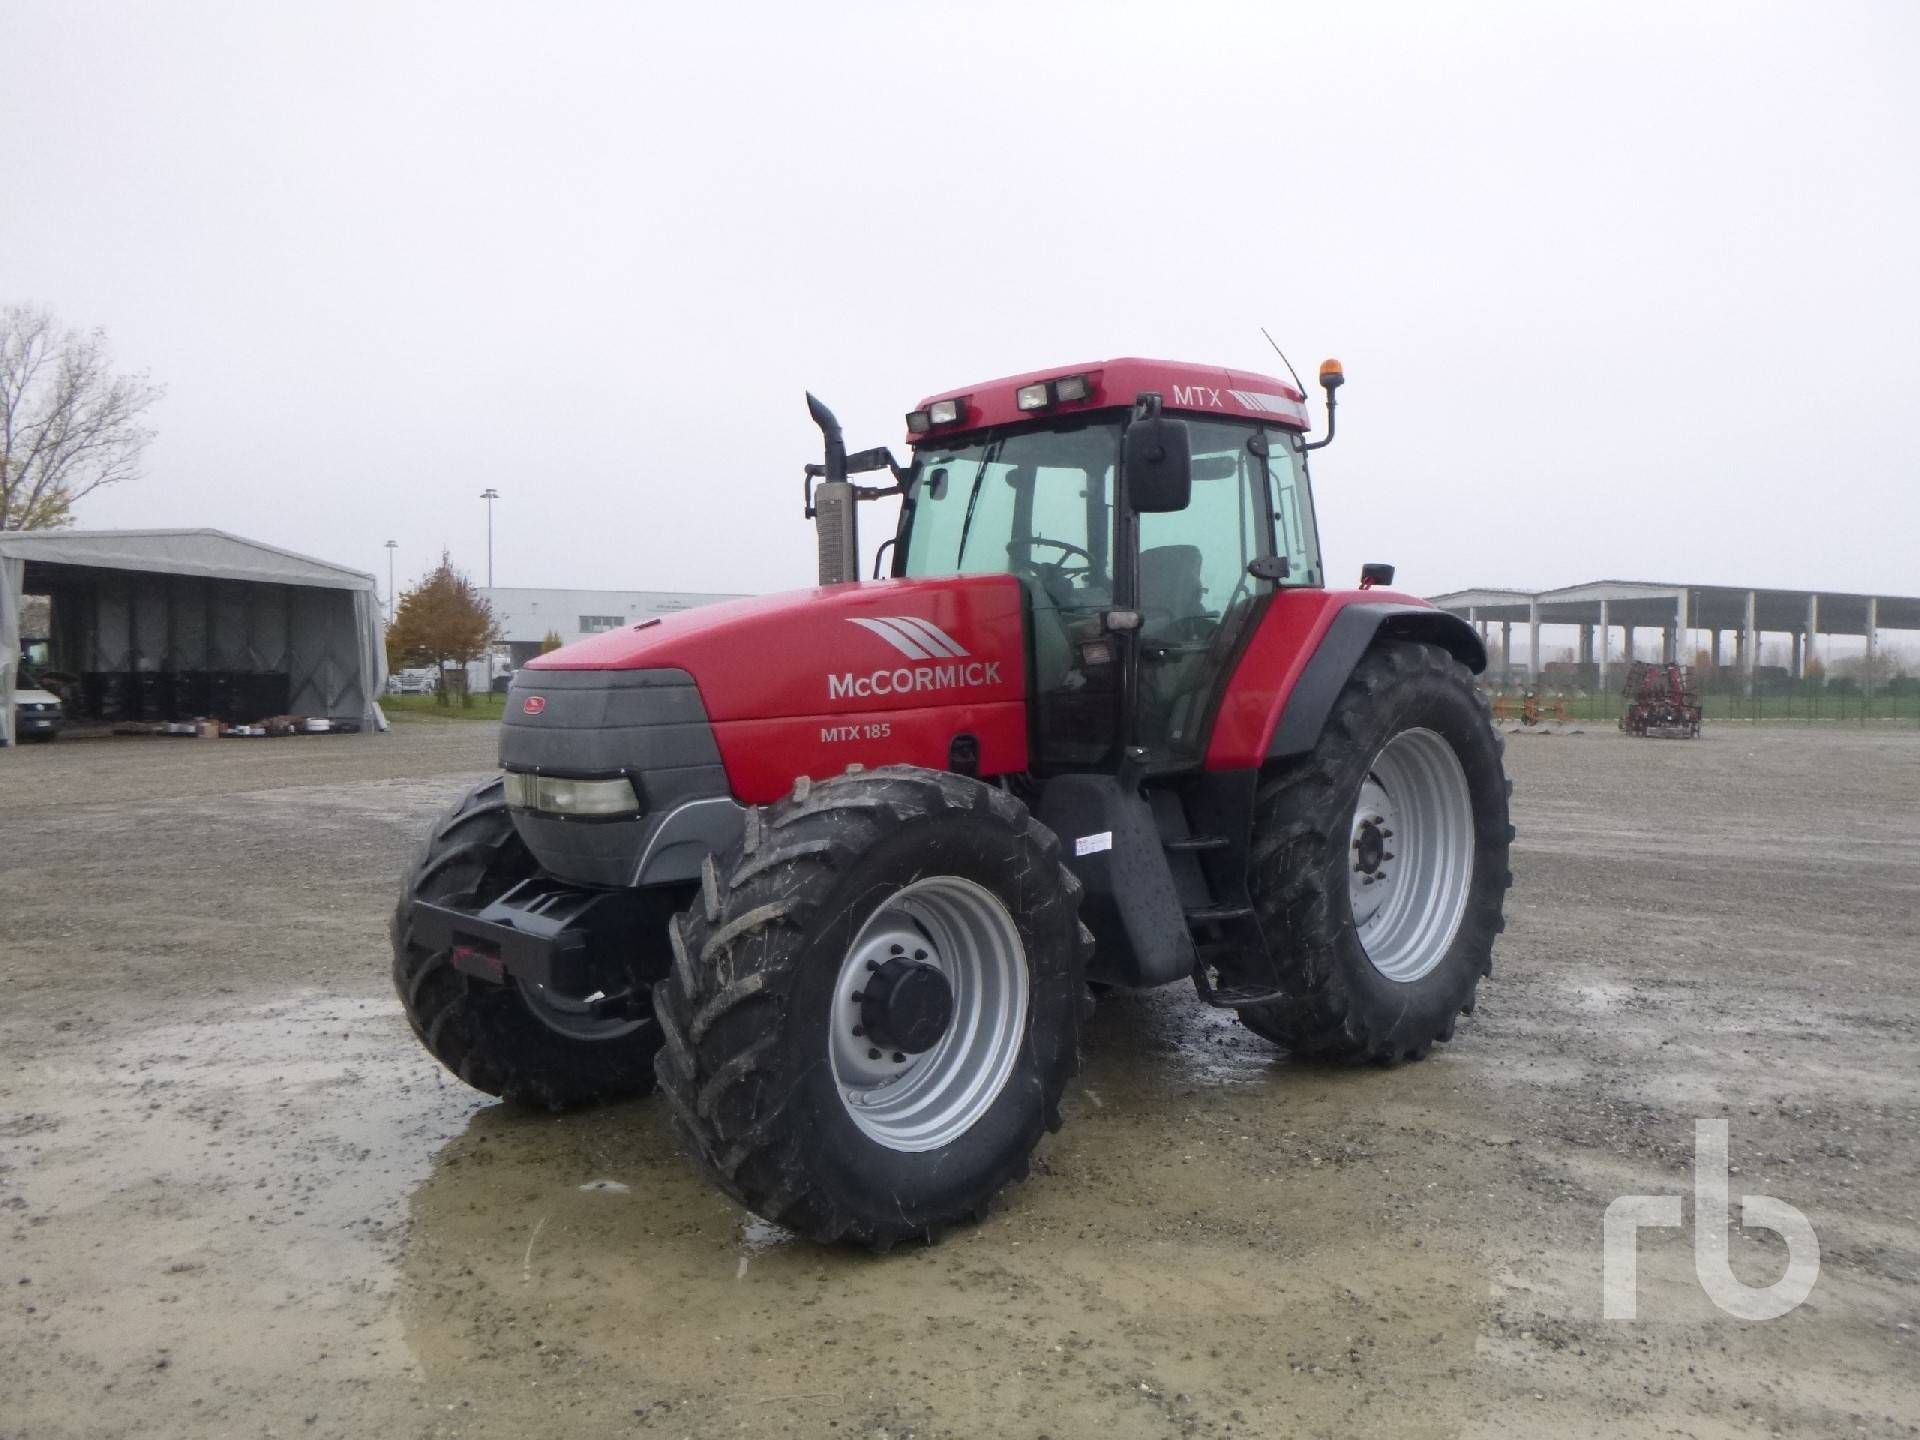 MCCORMICK MTX185 MFWD Traktor